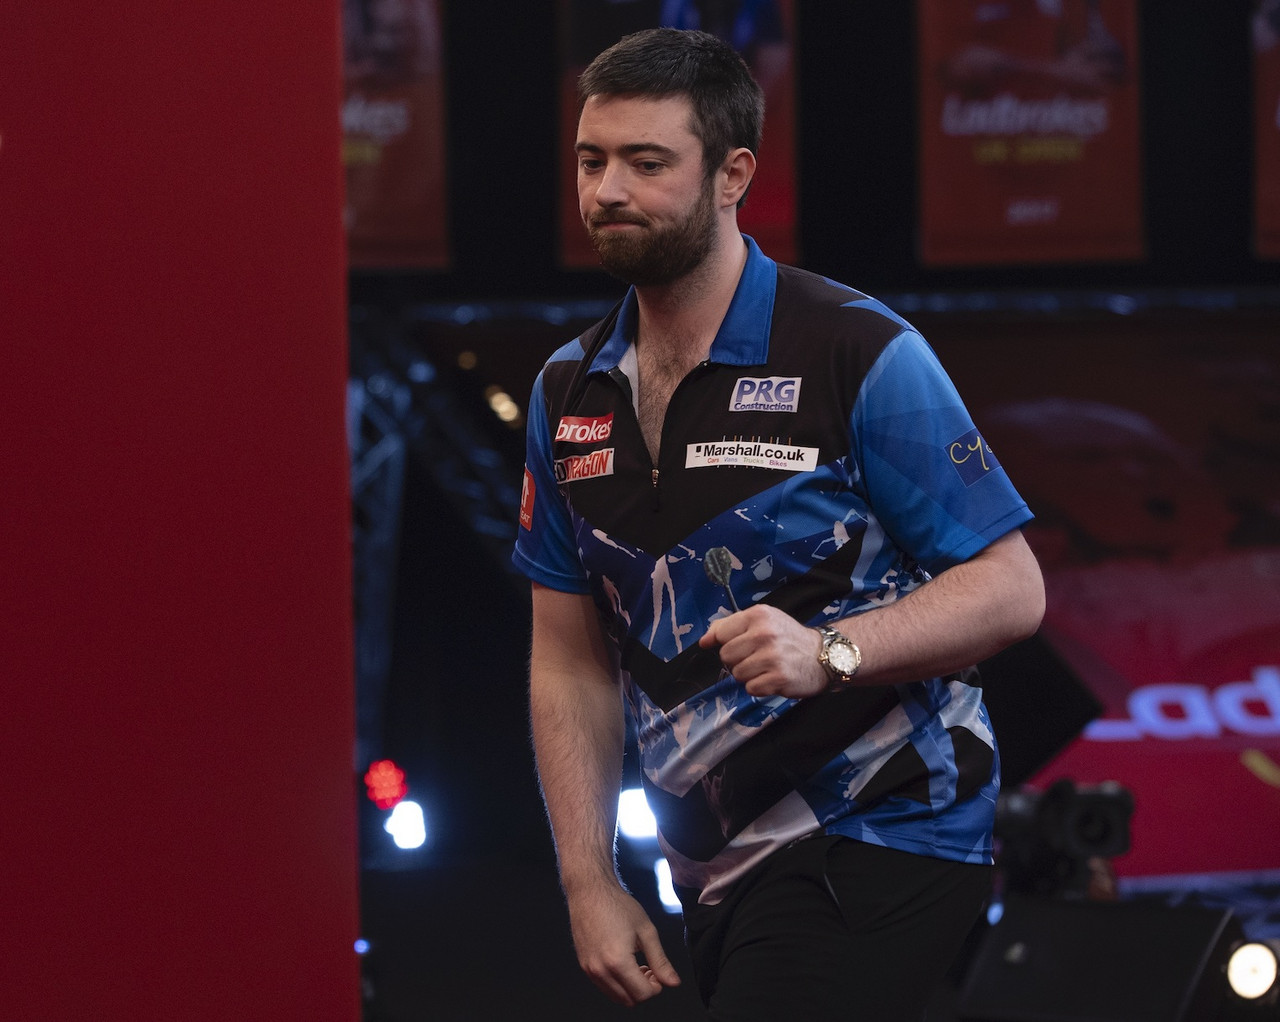 UK Open Darts: Luke Humphries to face two-time winner James Wade in Final